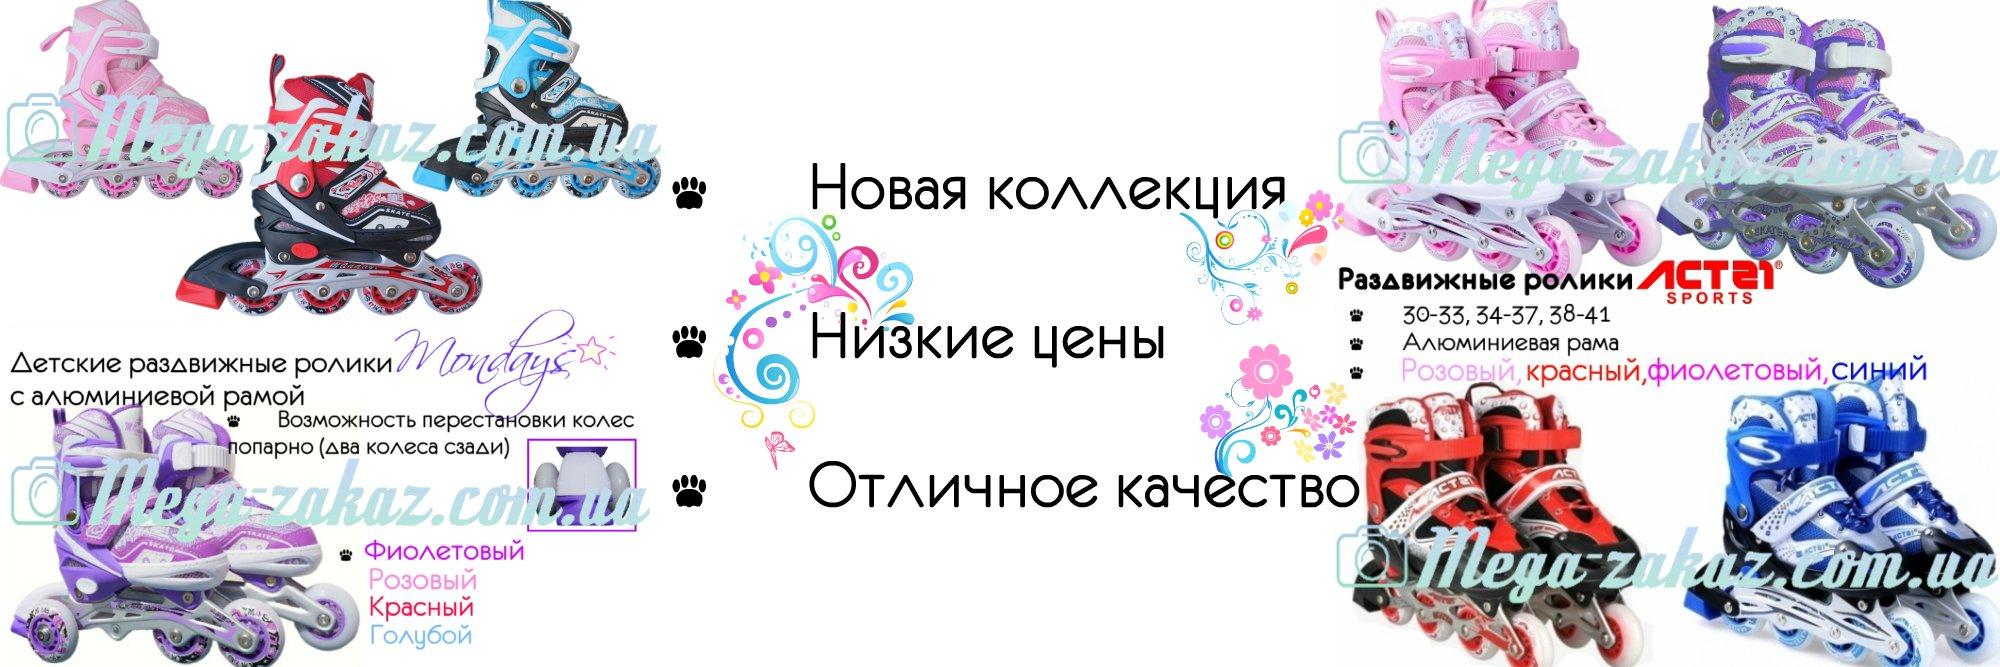 http://mega-zakaz.com.ua/images/upload/коллаж%20ролики.jpg